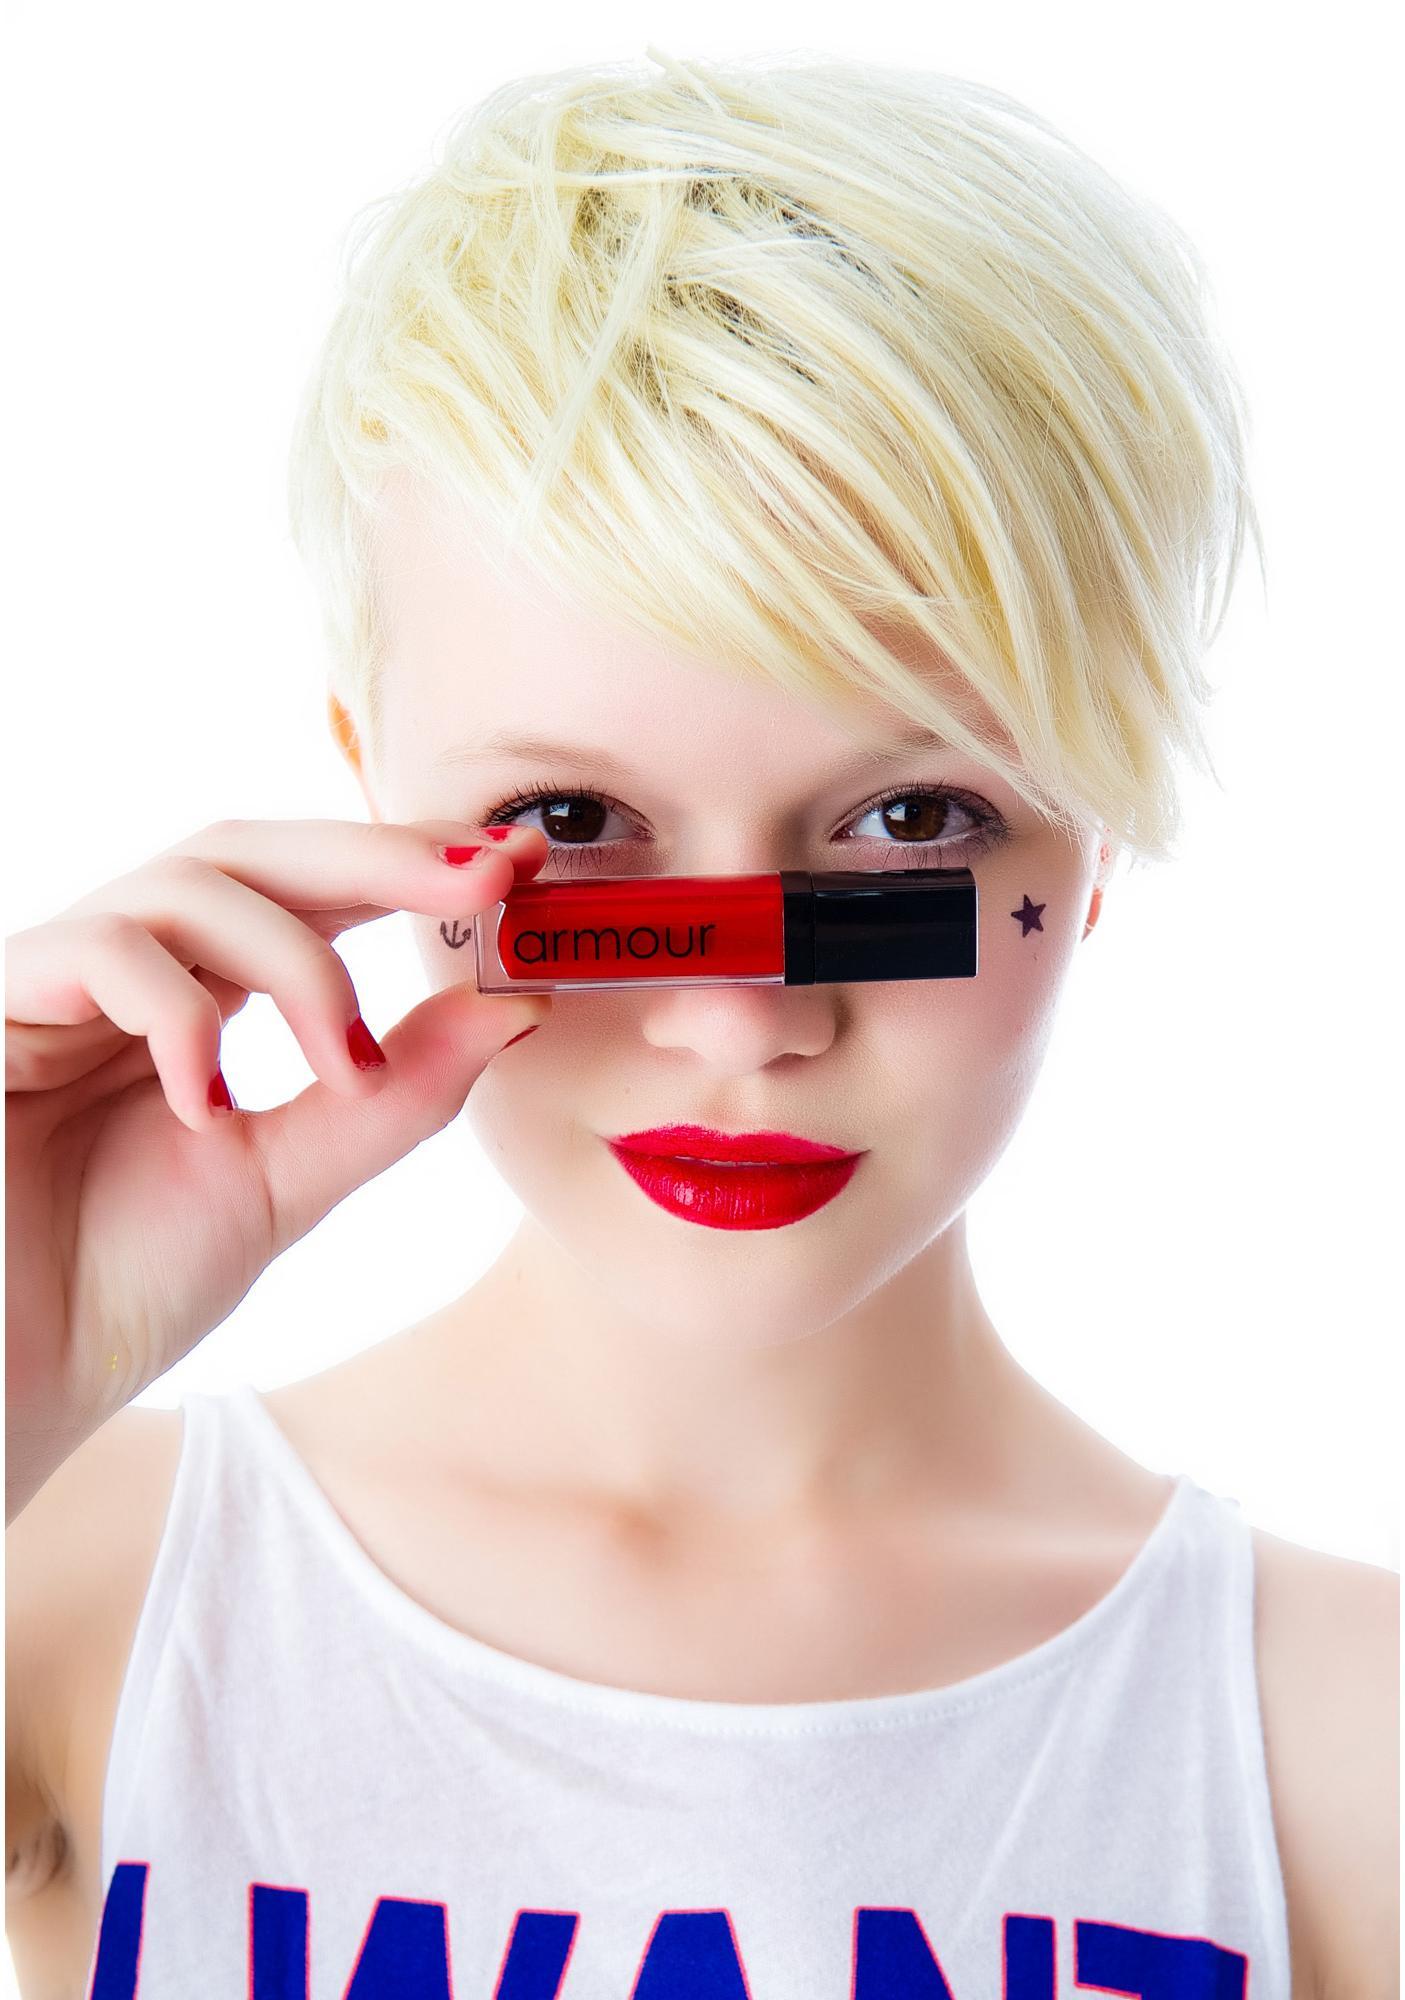 Armour Beauty Barracuda Opaque Lip Gloss